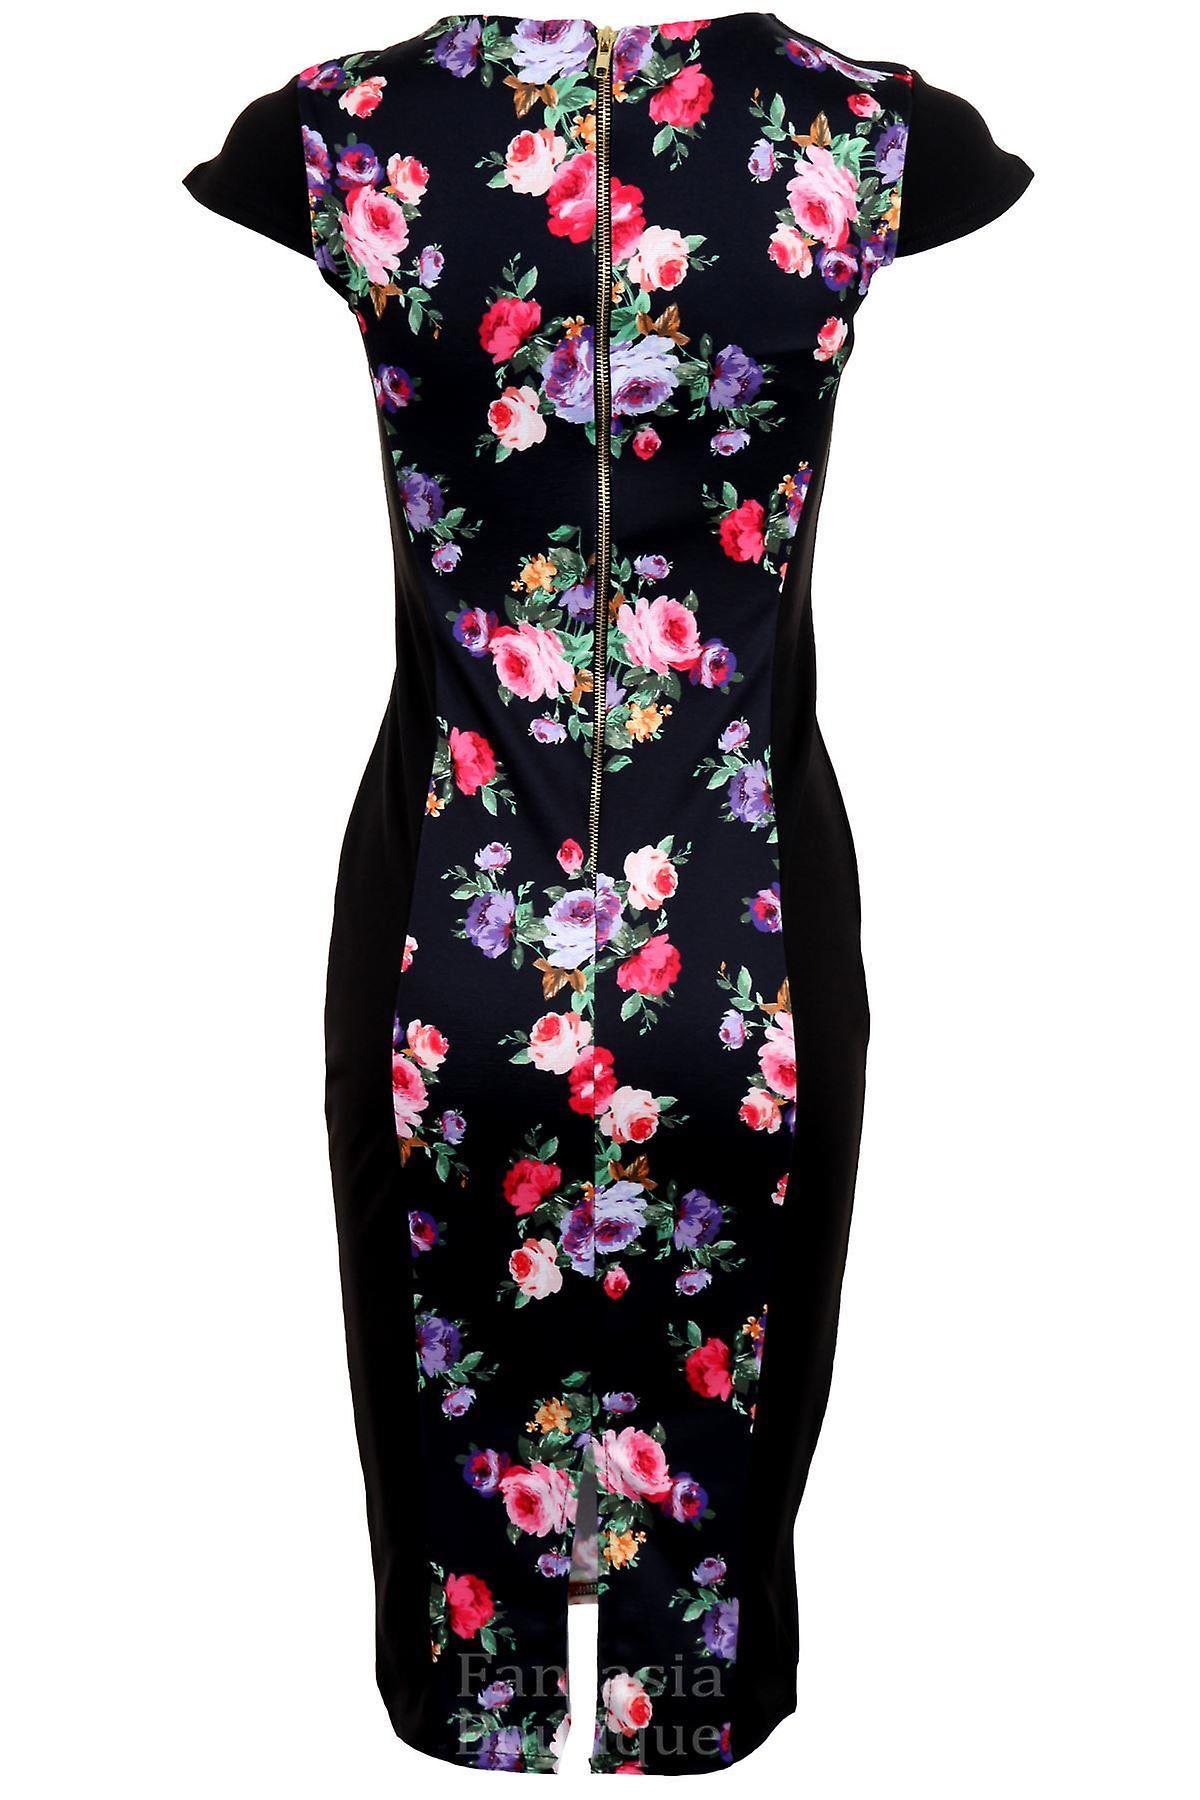 Ladies Cap Sleeve Cut Out Neck Midi Floral Diamond Print Women's Bodycon Dress